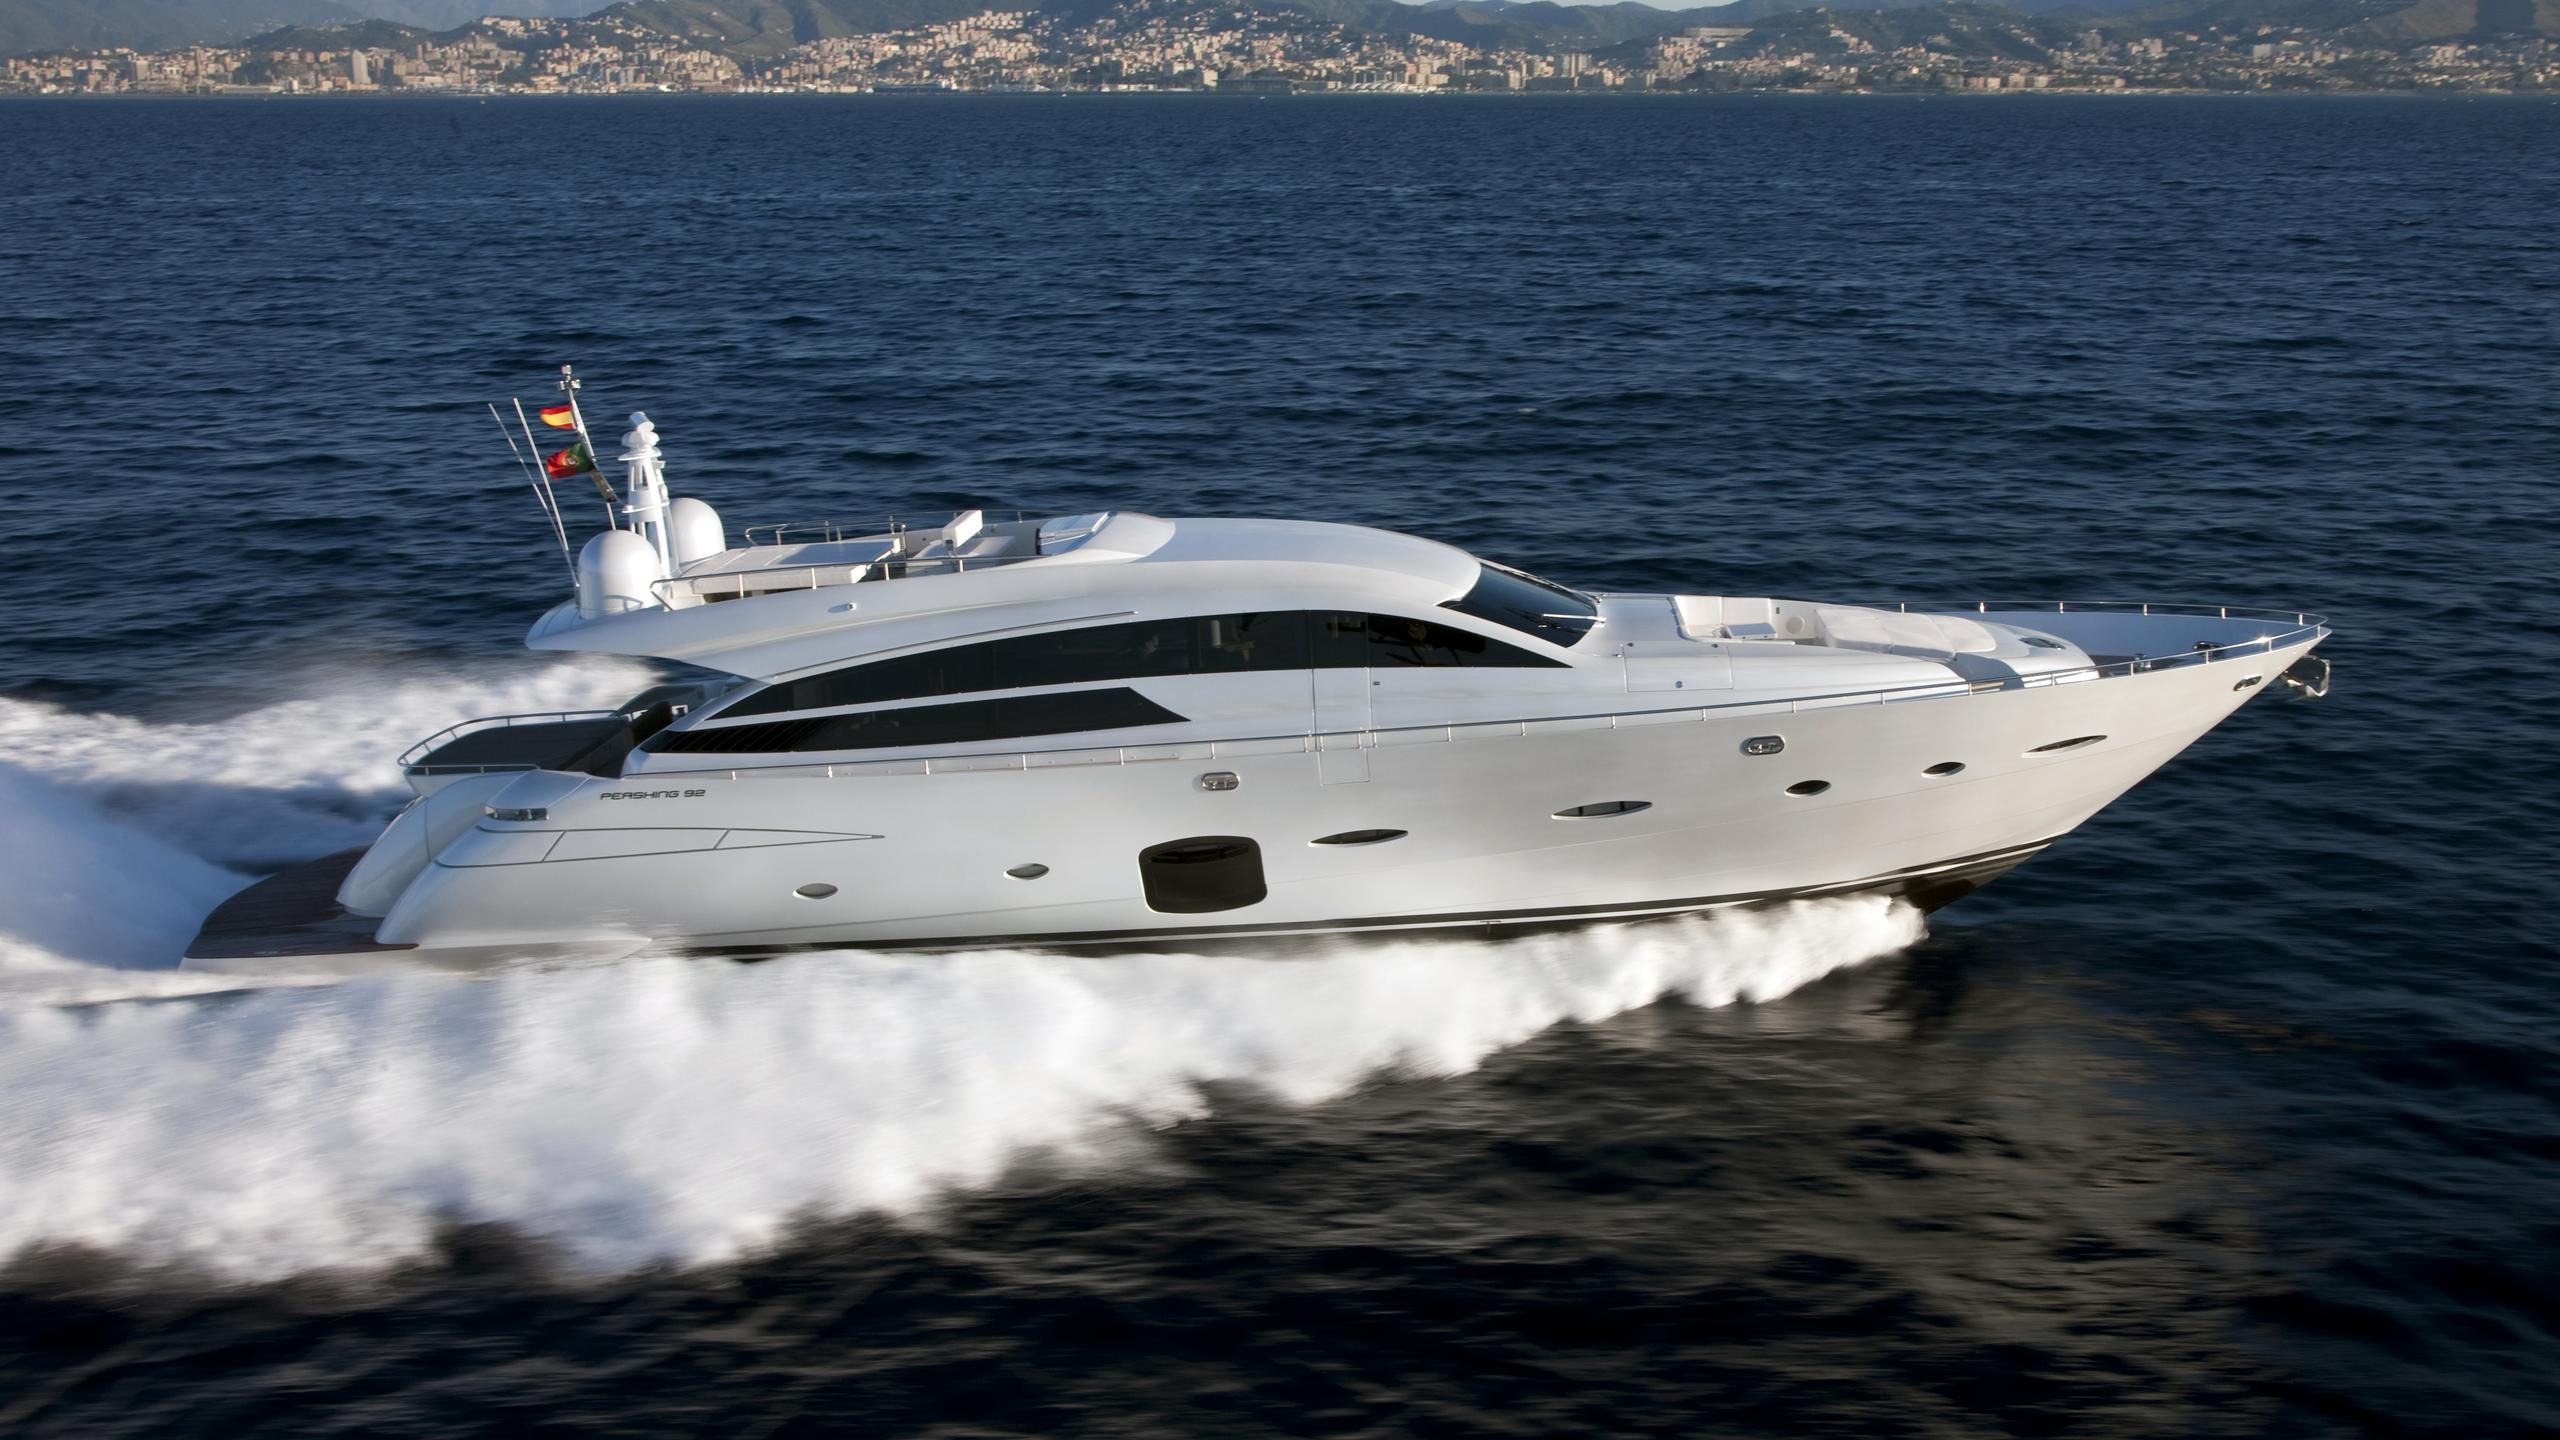 cavallino-motor-yacht-pershing-92-2011-28m-cruising